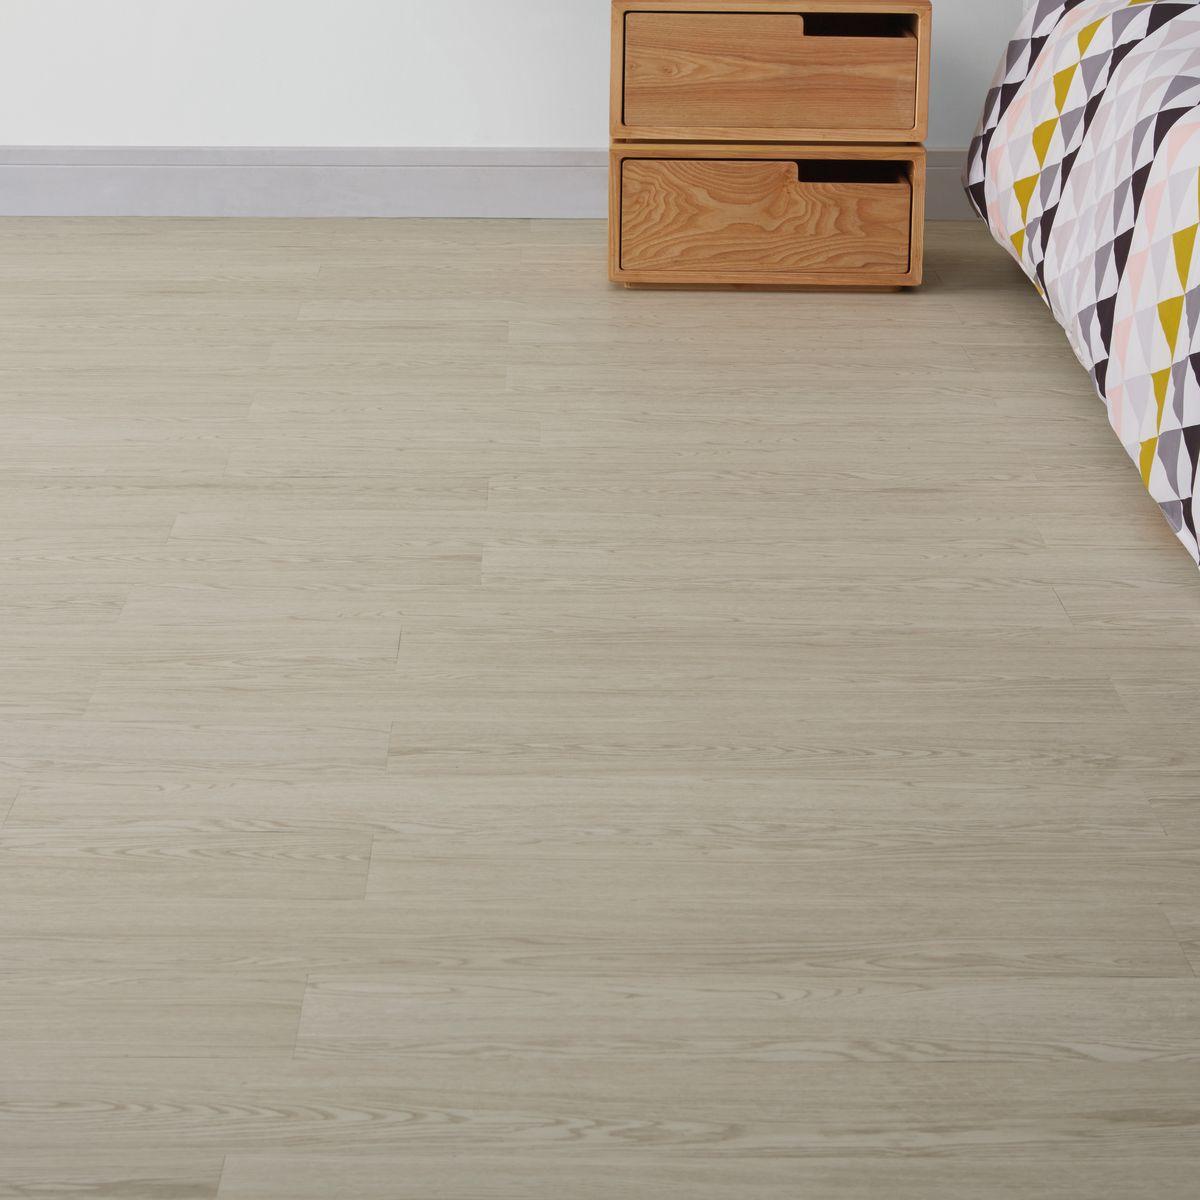 pavimento da esterno legno leroy merlin: cucine industriali ... - Leroy Merlin Posa Piastrelle